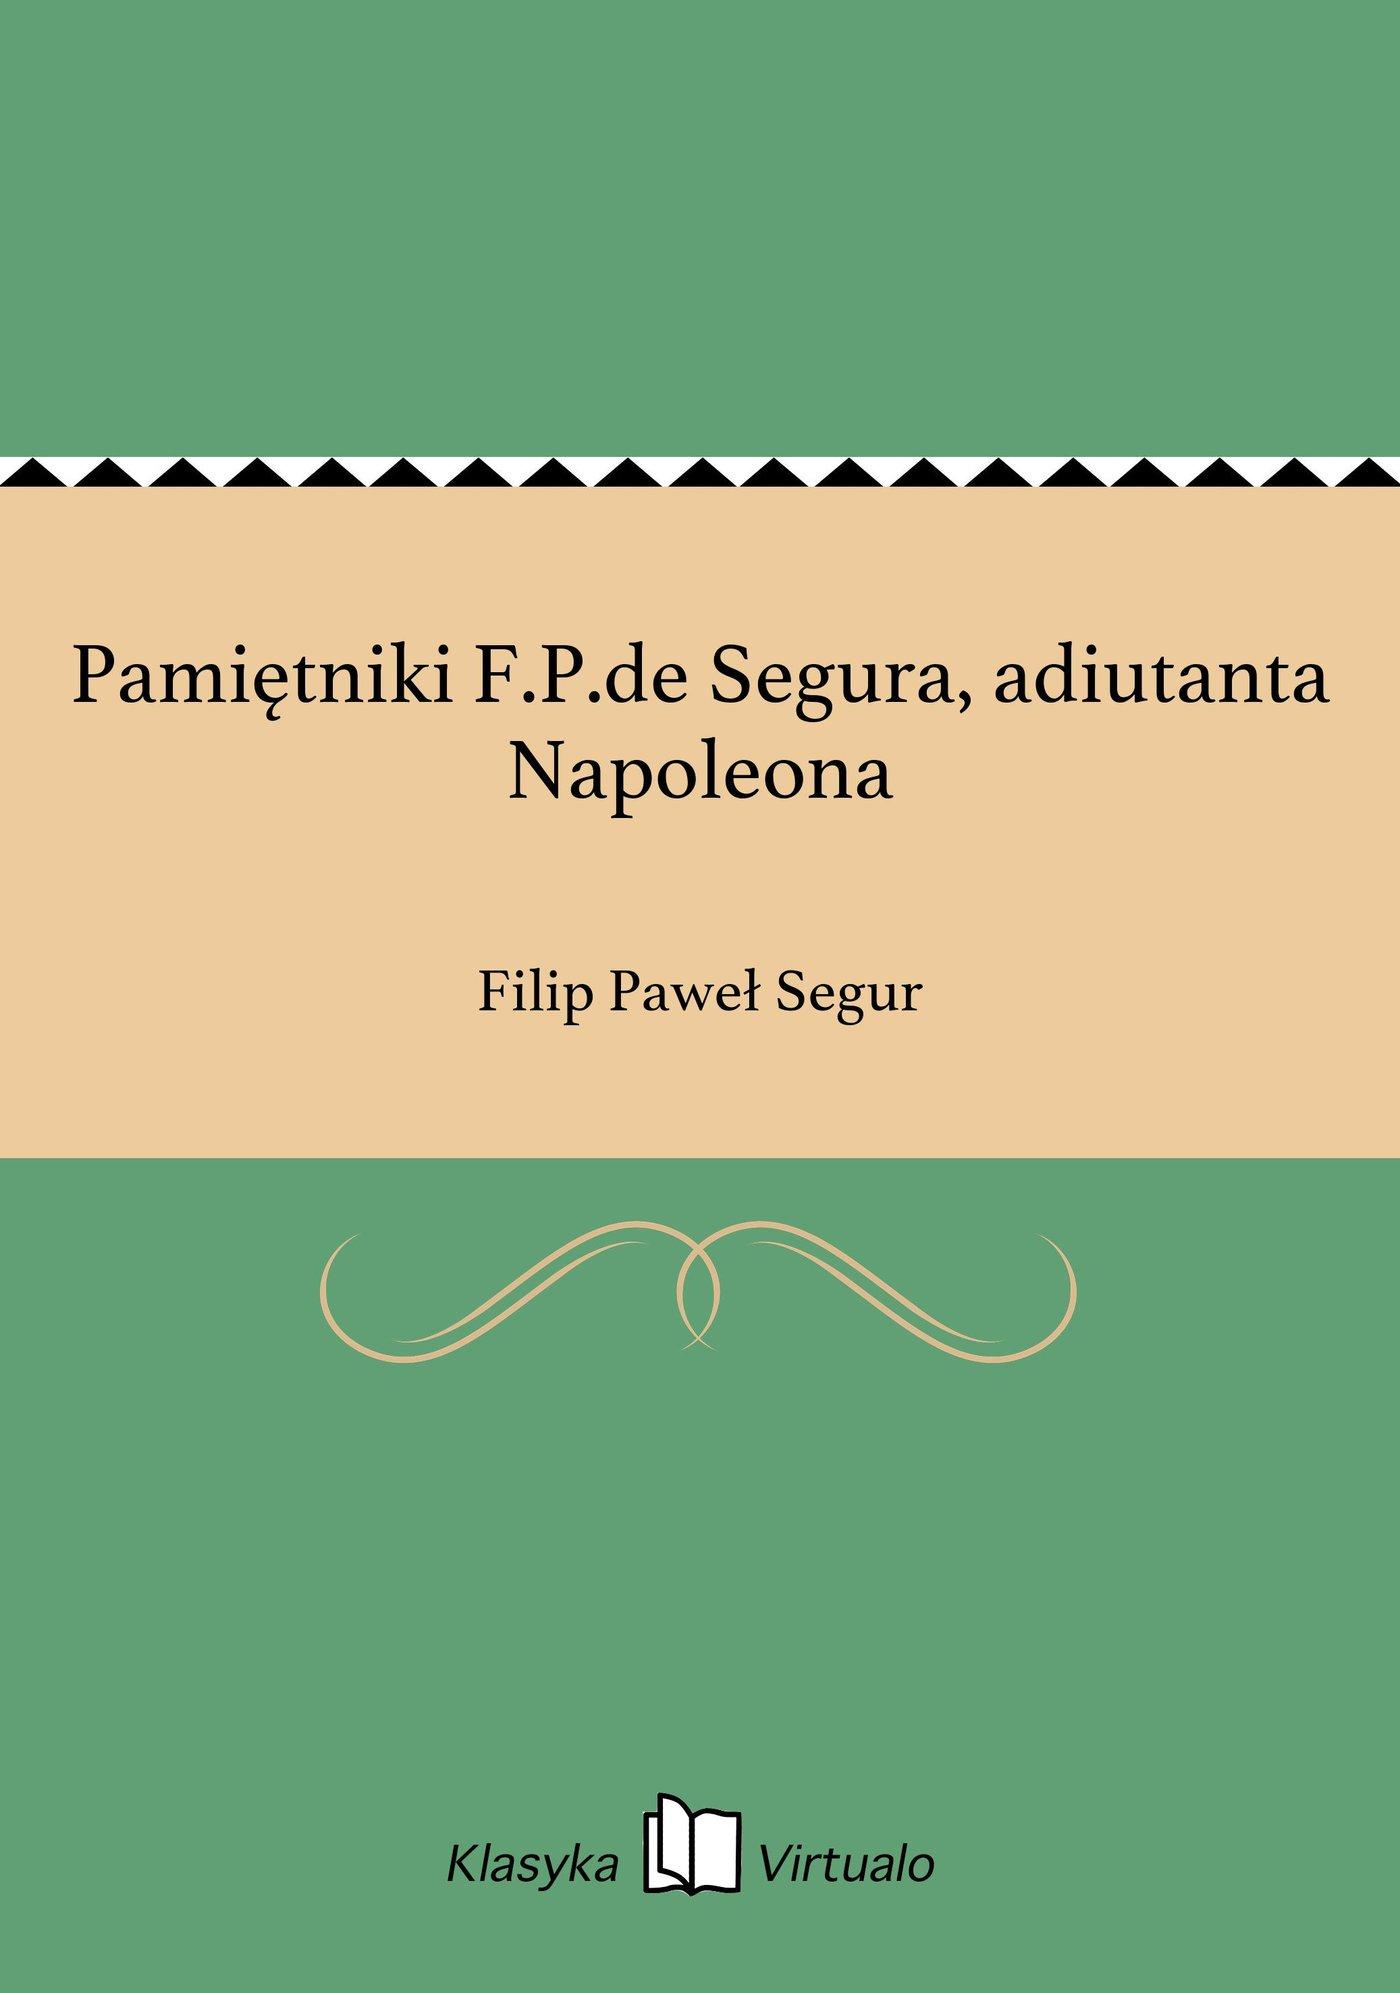 Pamiętniki F.P.de Segura, adiutanta Napoleona - Ebook (Książka na Kindle) do pobrania w formacie MOBI